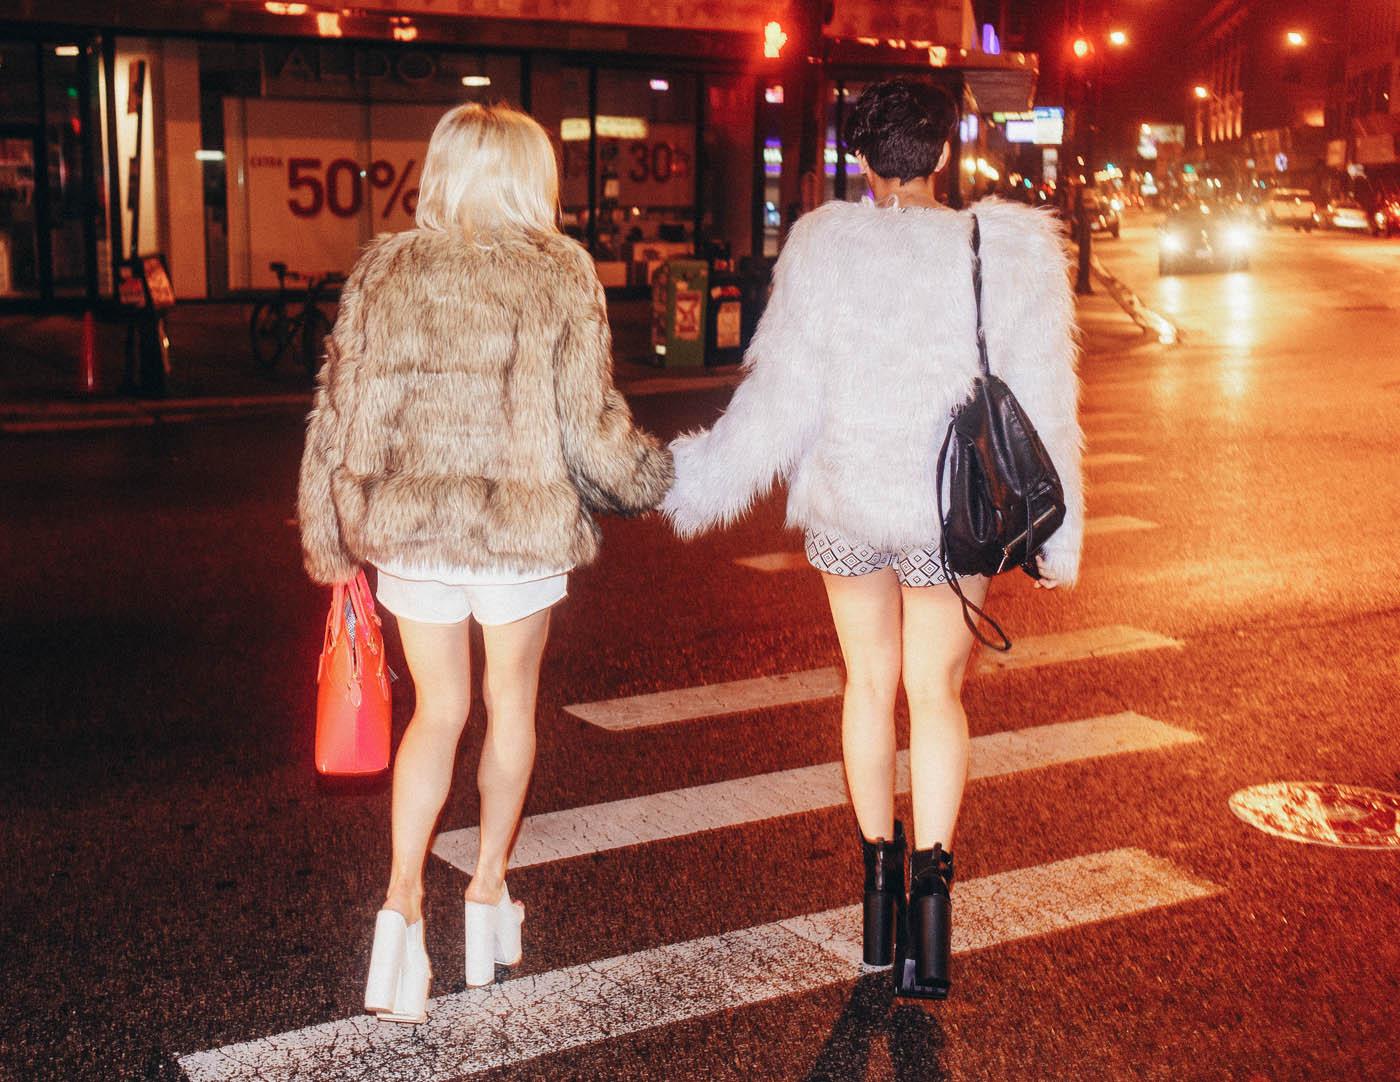 GirlsNight_6982.jpg